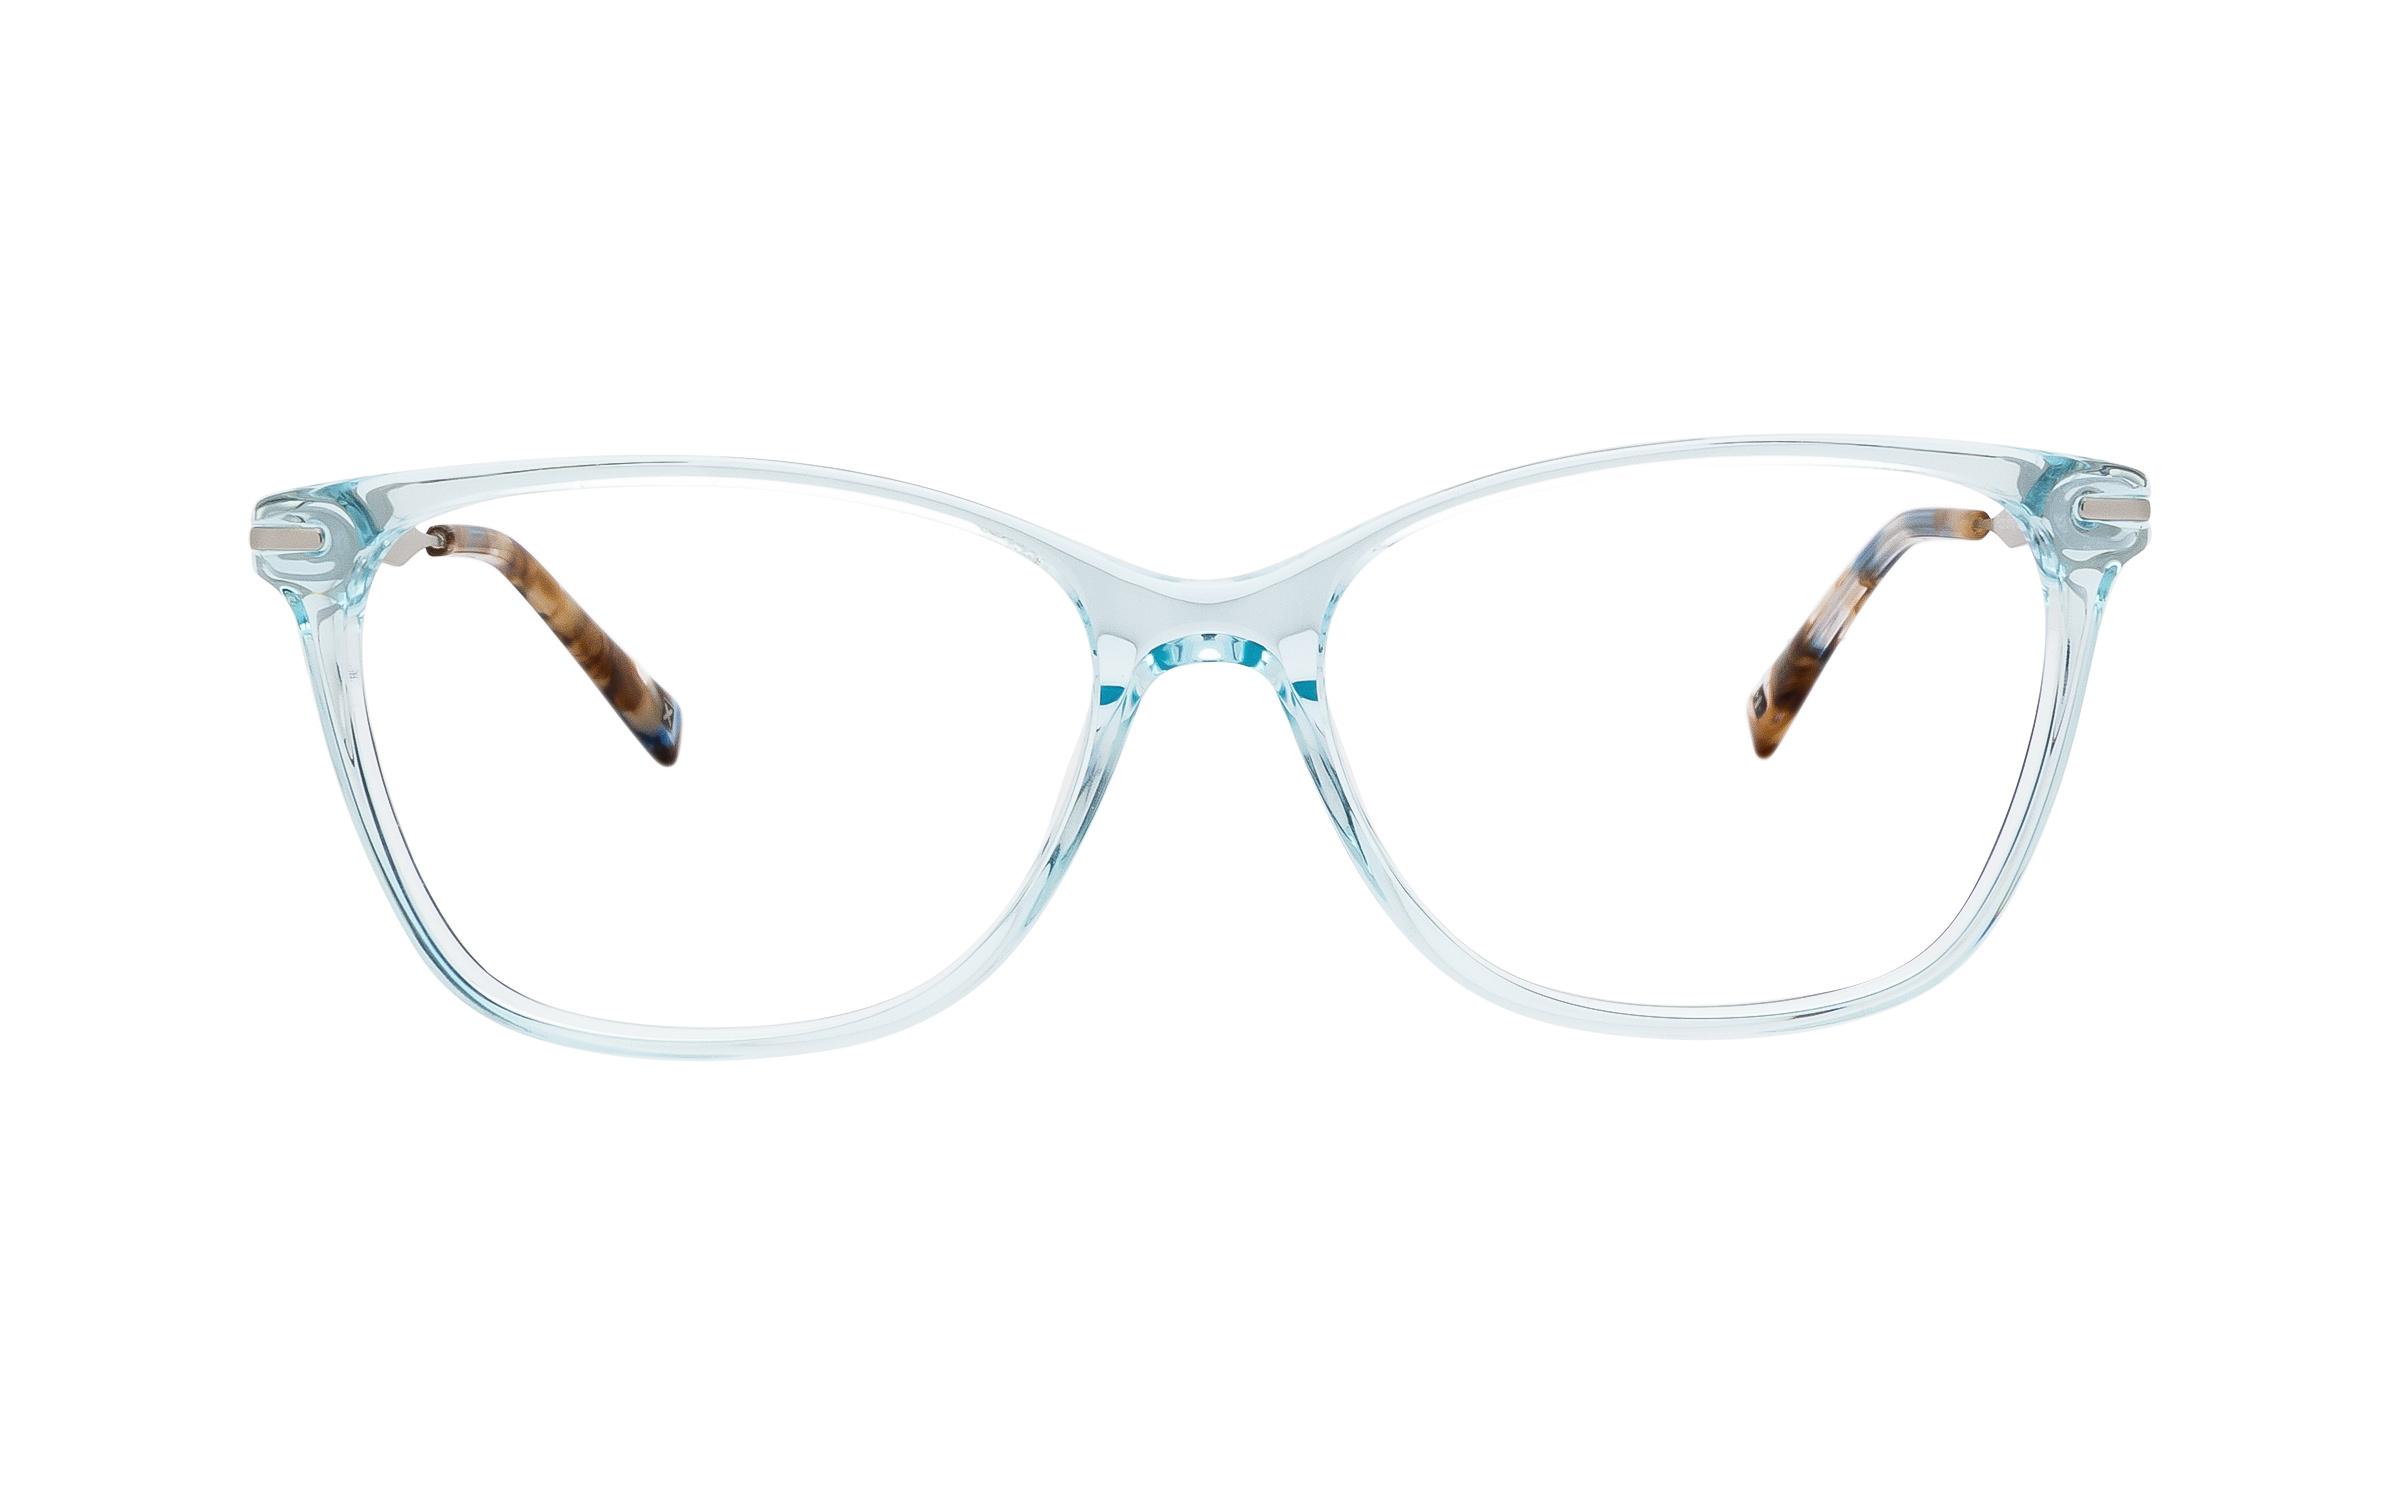 http://www.coastal.com/ - Derek Cardigan Pictor DC231 C02 (54) Eyeglasses and Frame in Shiny Crystal Light Blue | Acetate/Metal – Online Coastal